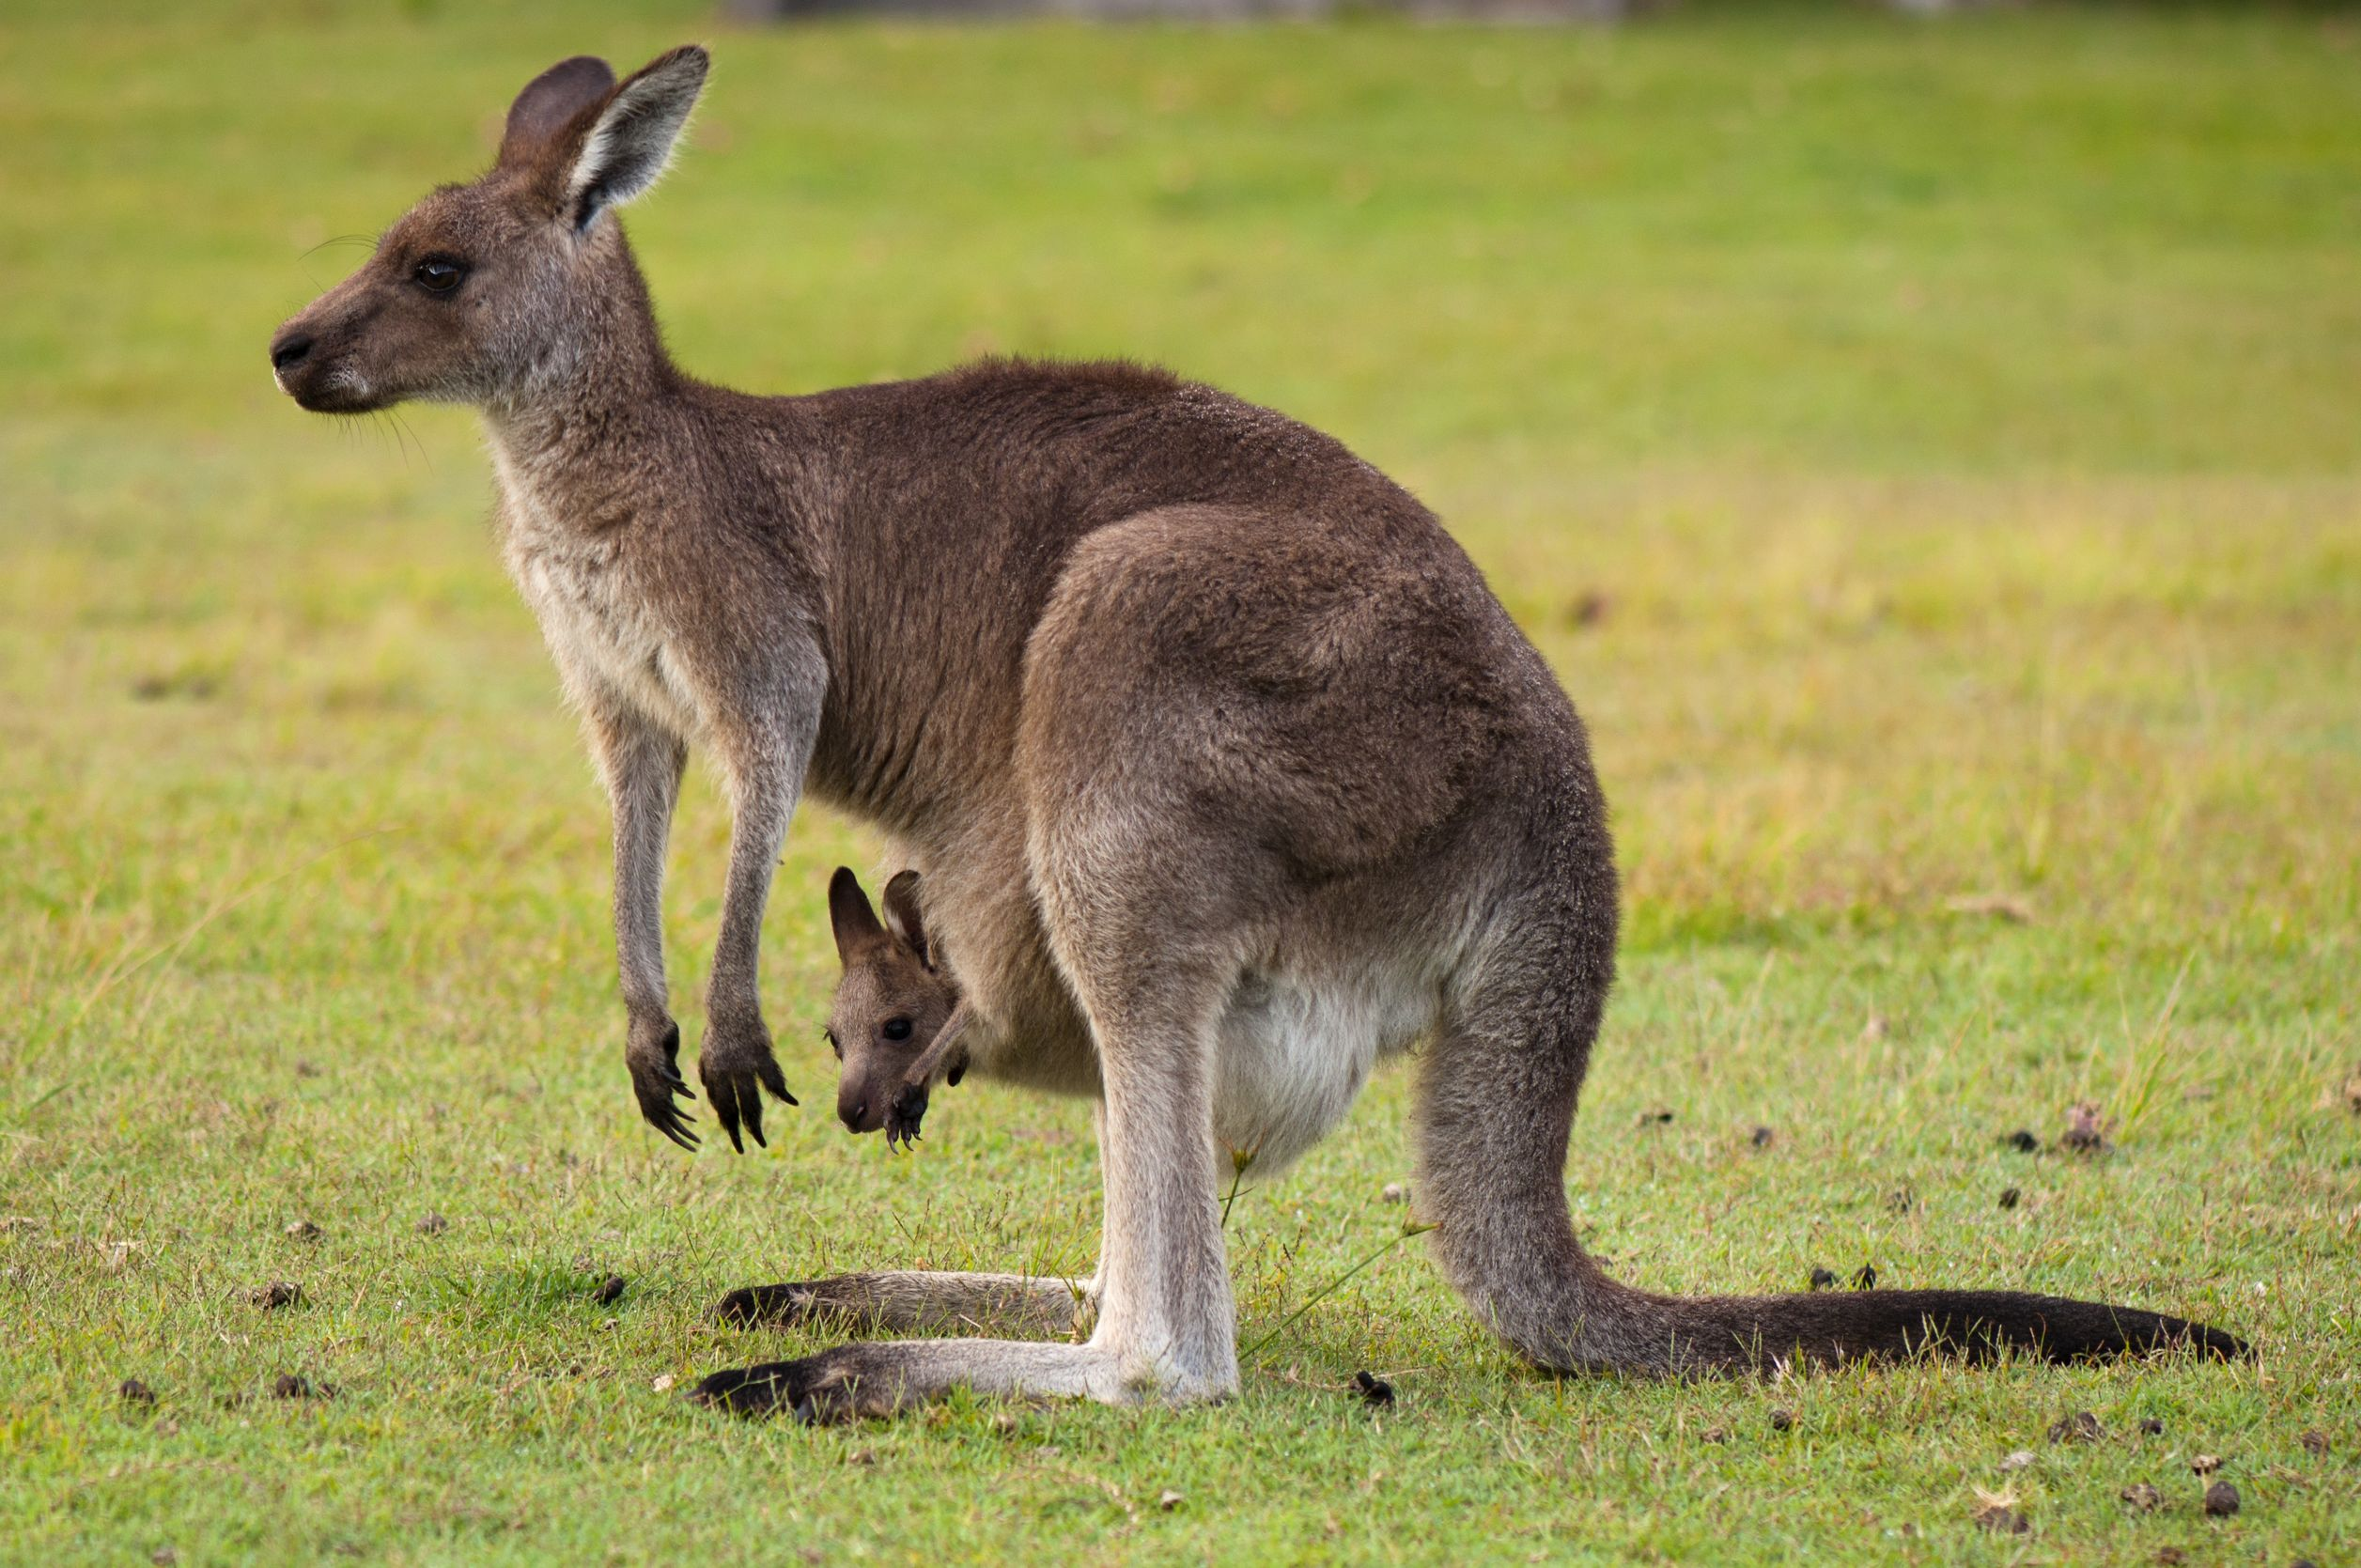 australia kangaroo and baby 123rf